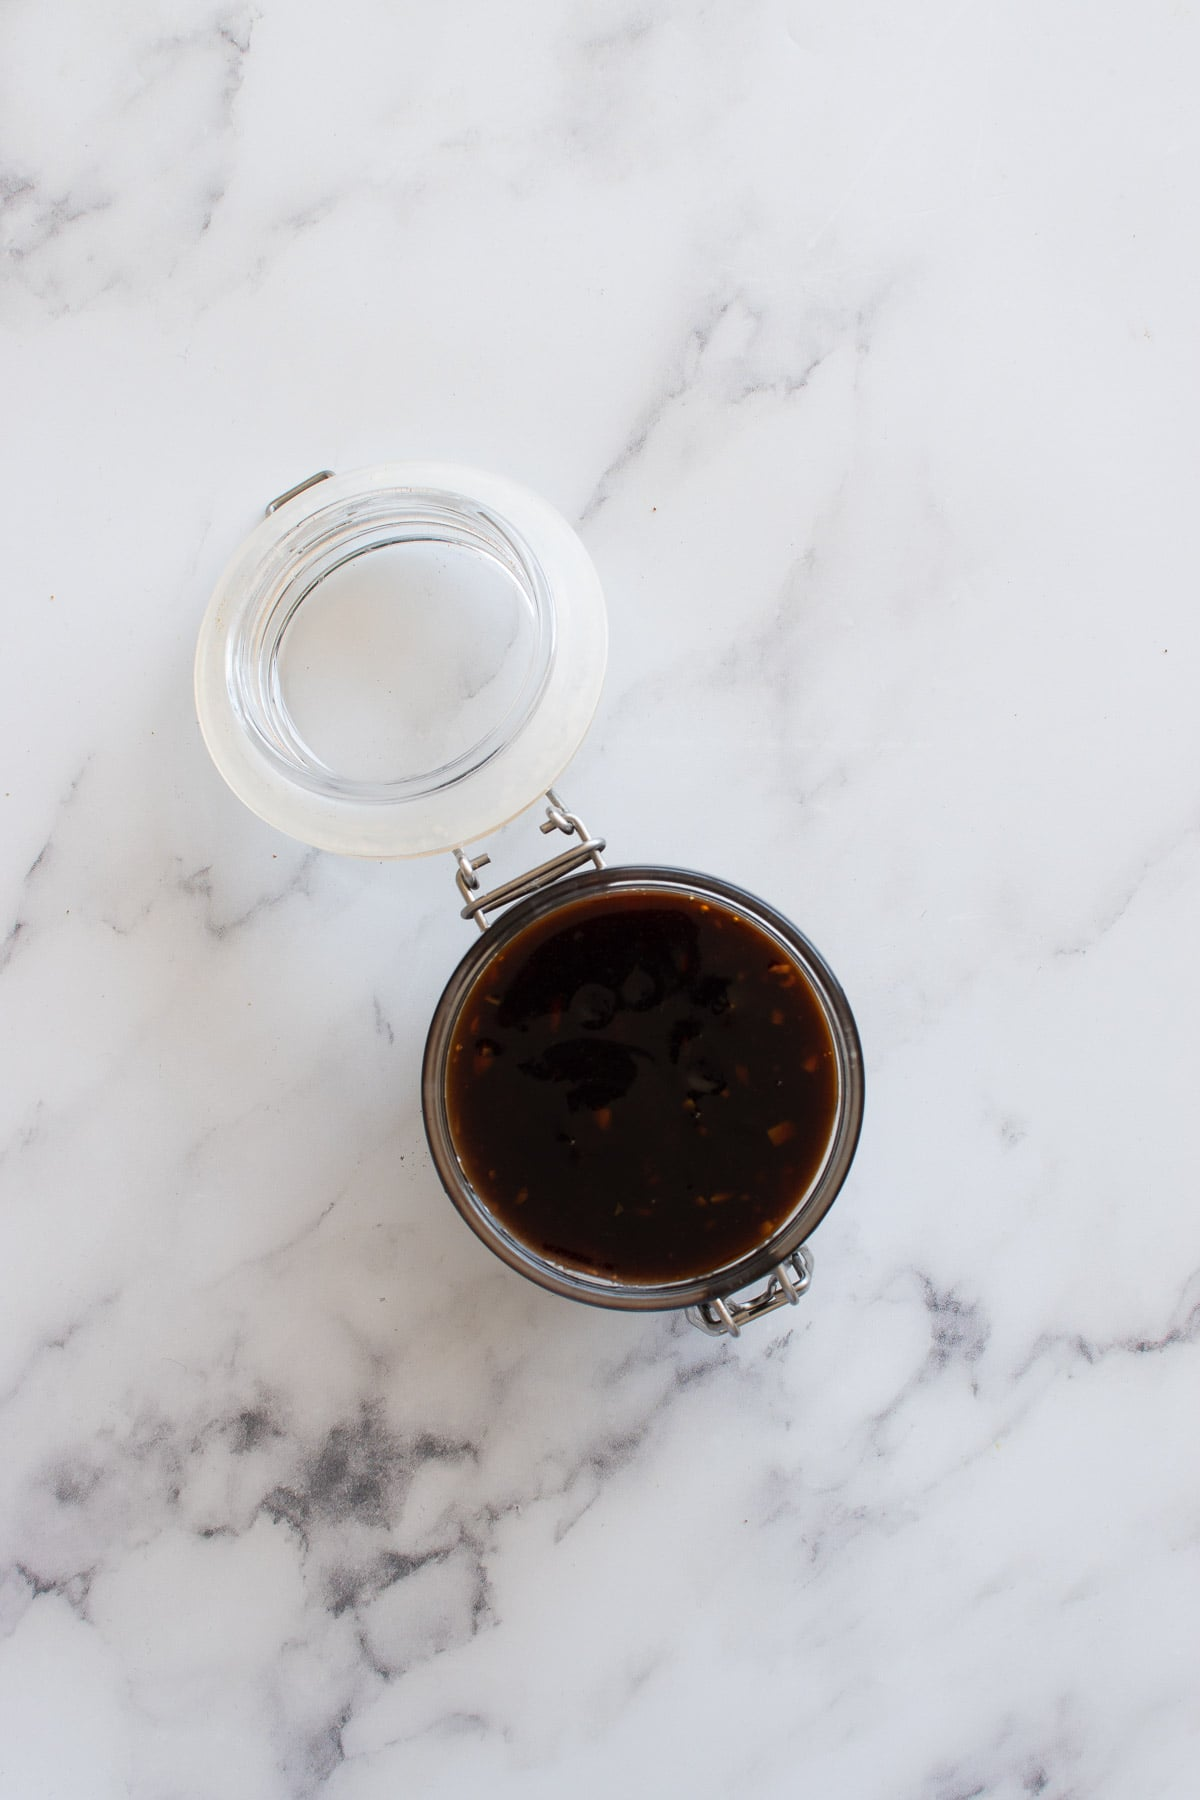 A sealed jar with homemade teriyaki sauce.